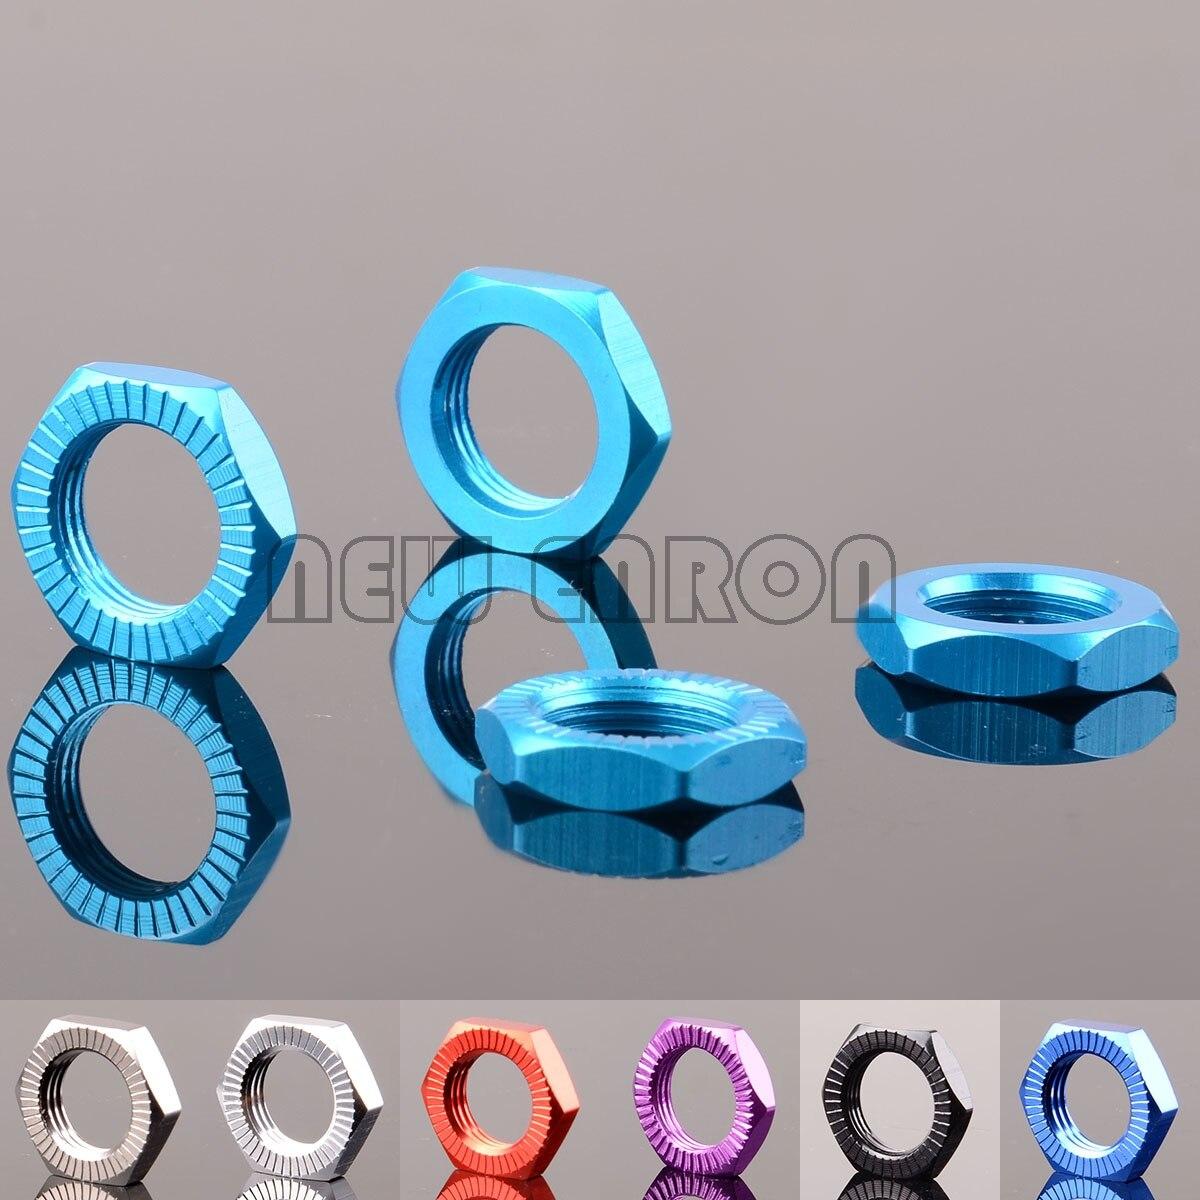 NEW ENRON 4PCS Aluminium 17mm Wheel Hex Nuts Mount #7758 For RC 1/5 Traxxas X-MAXX 77086-4